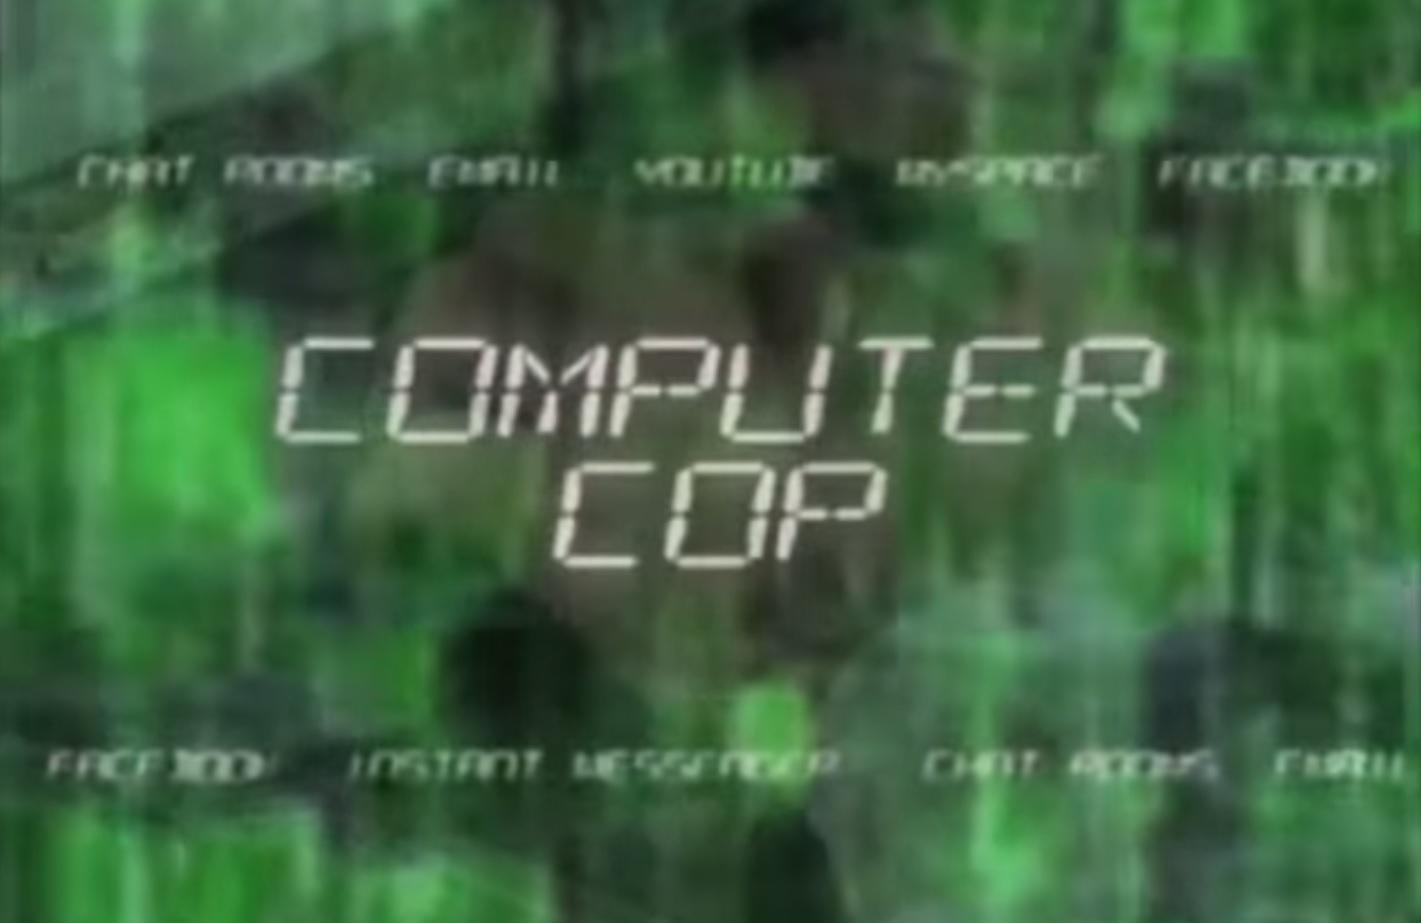 computercop spyware eff